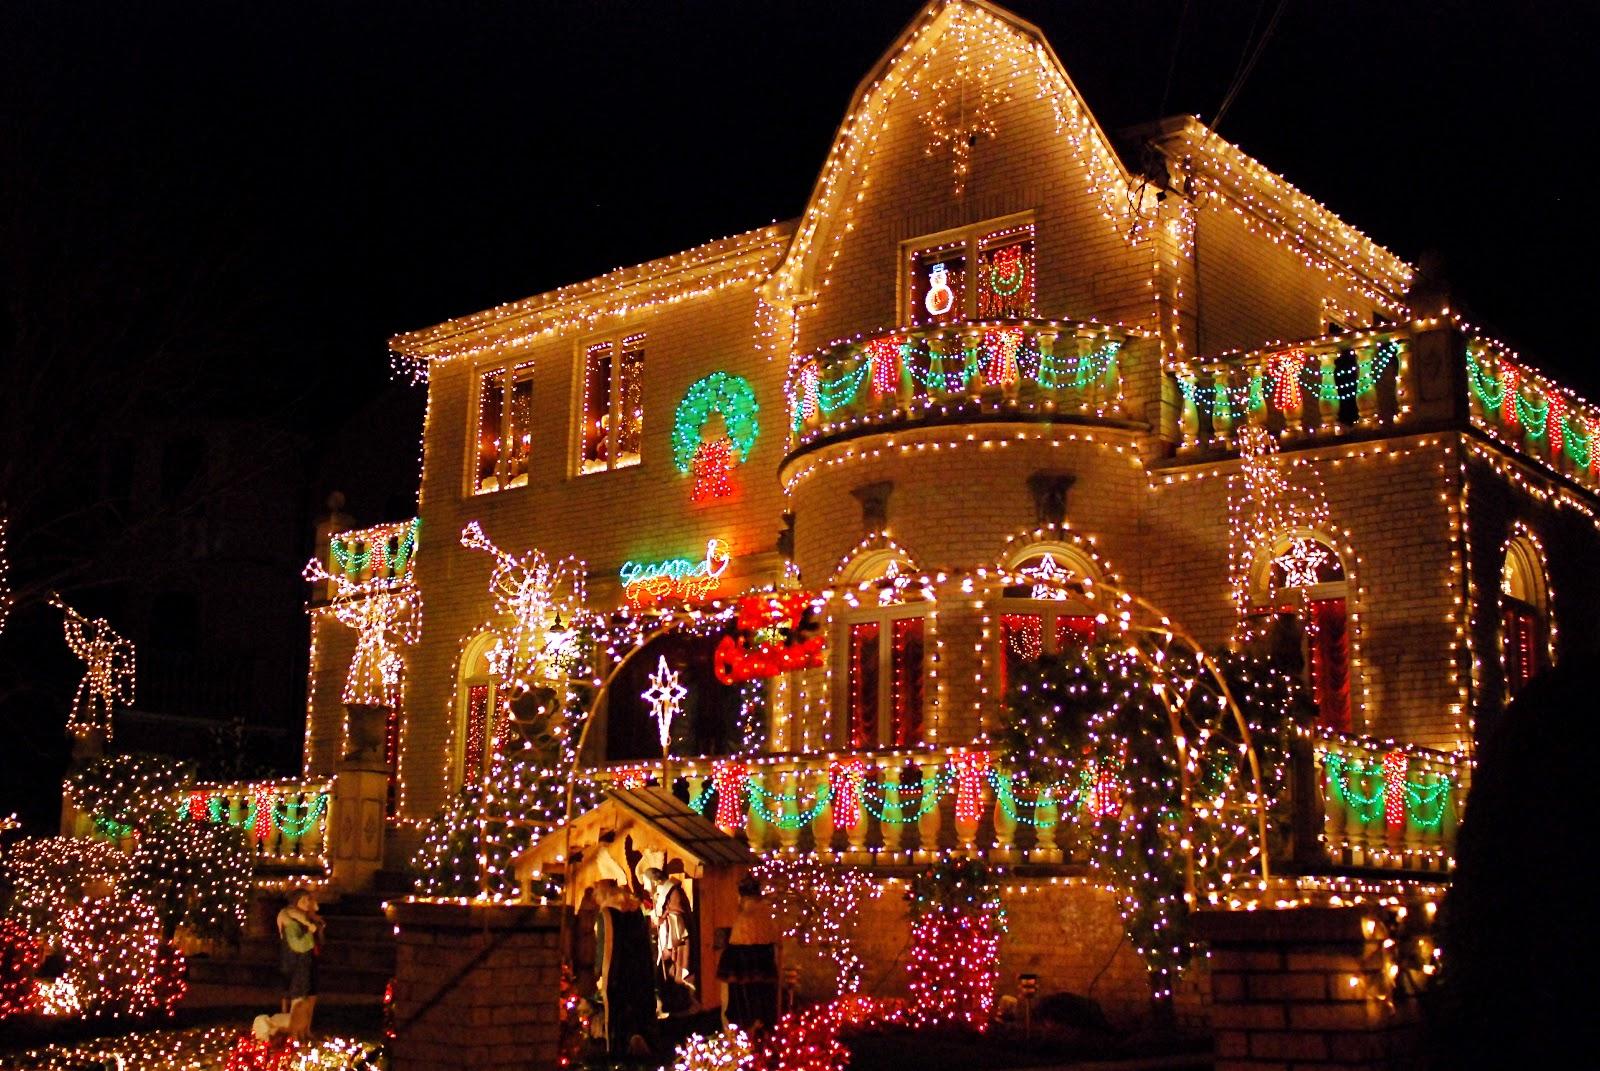 NYC ♥ NYC: Brooklyn's Dyker Heights Home Christmas Light